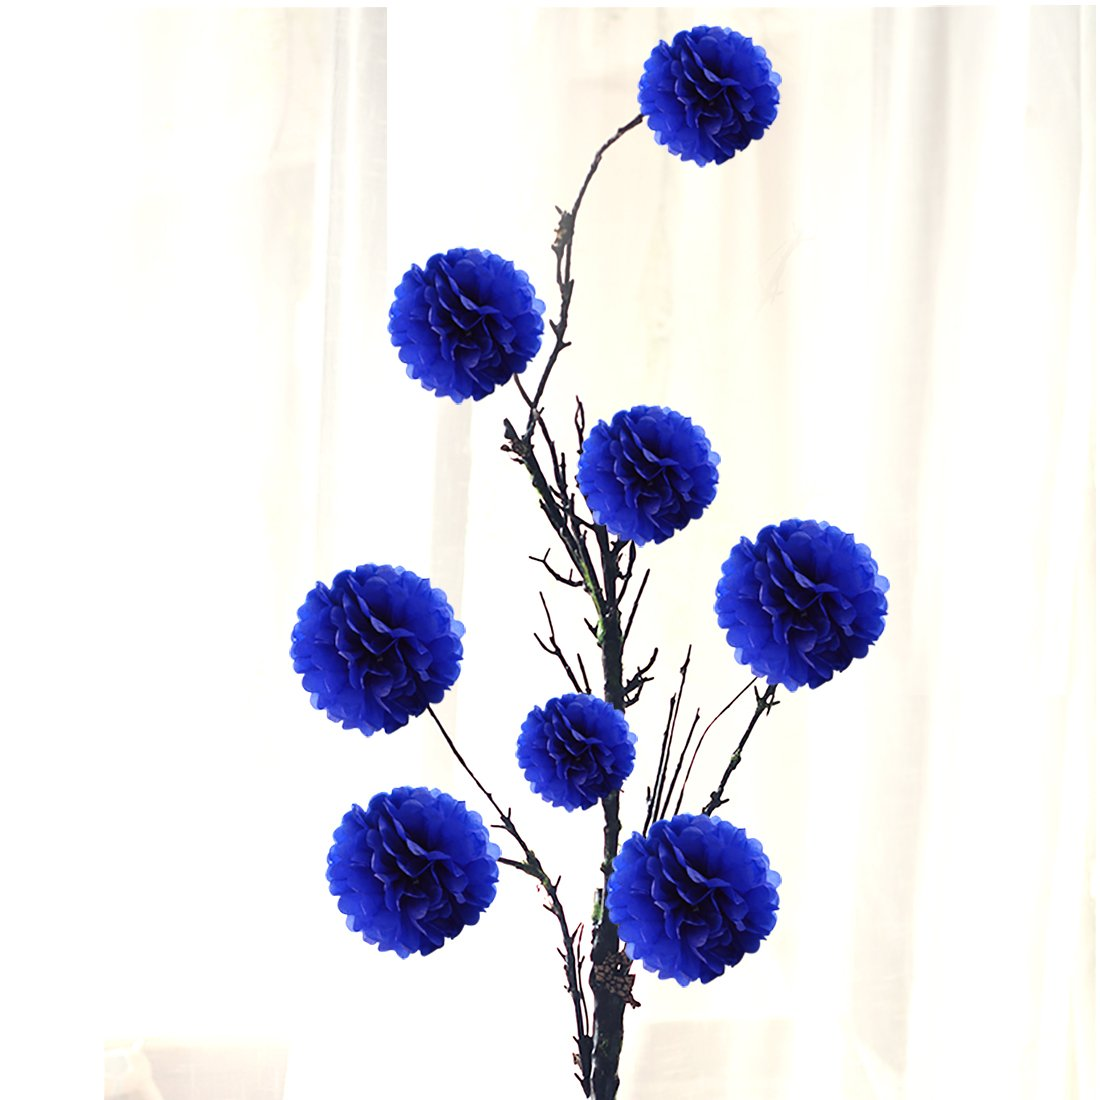 Amazon.com: 10pcs Royal Blue Tissue Hanging Paper Pom-poms, Hmxpls ...